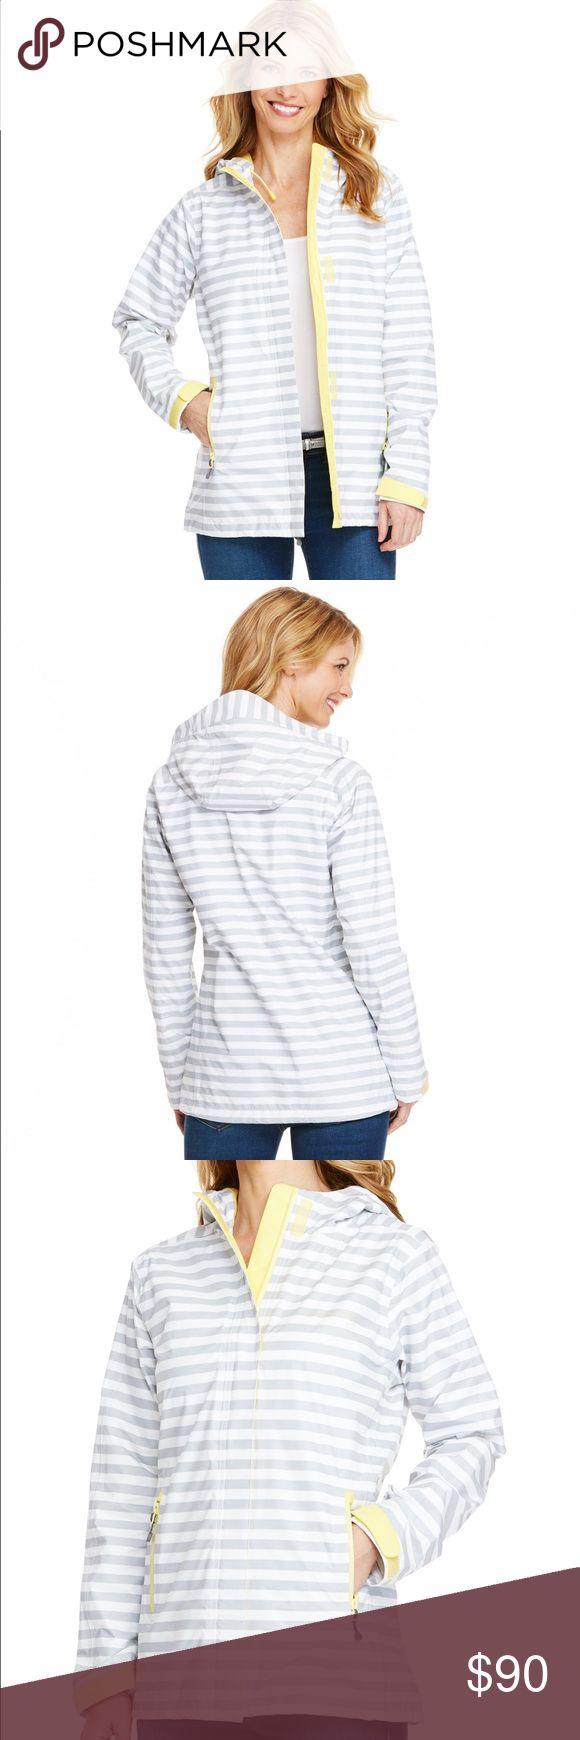 NTW Vineyard vines women's rain jacket NTW Vineyard Vines women's rain jacket. Size XL. Yellow Stow & Go Raincoat. Vineyard Vines Jackets & Coats